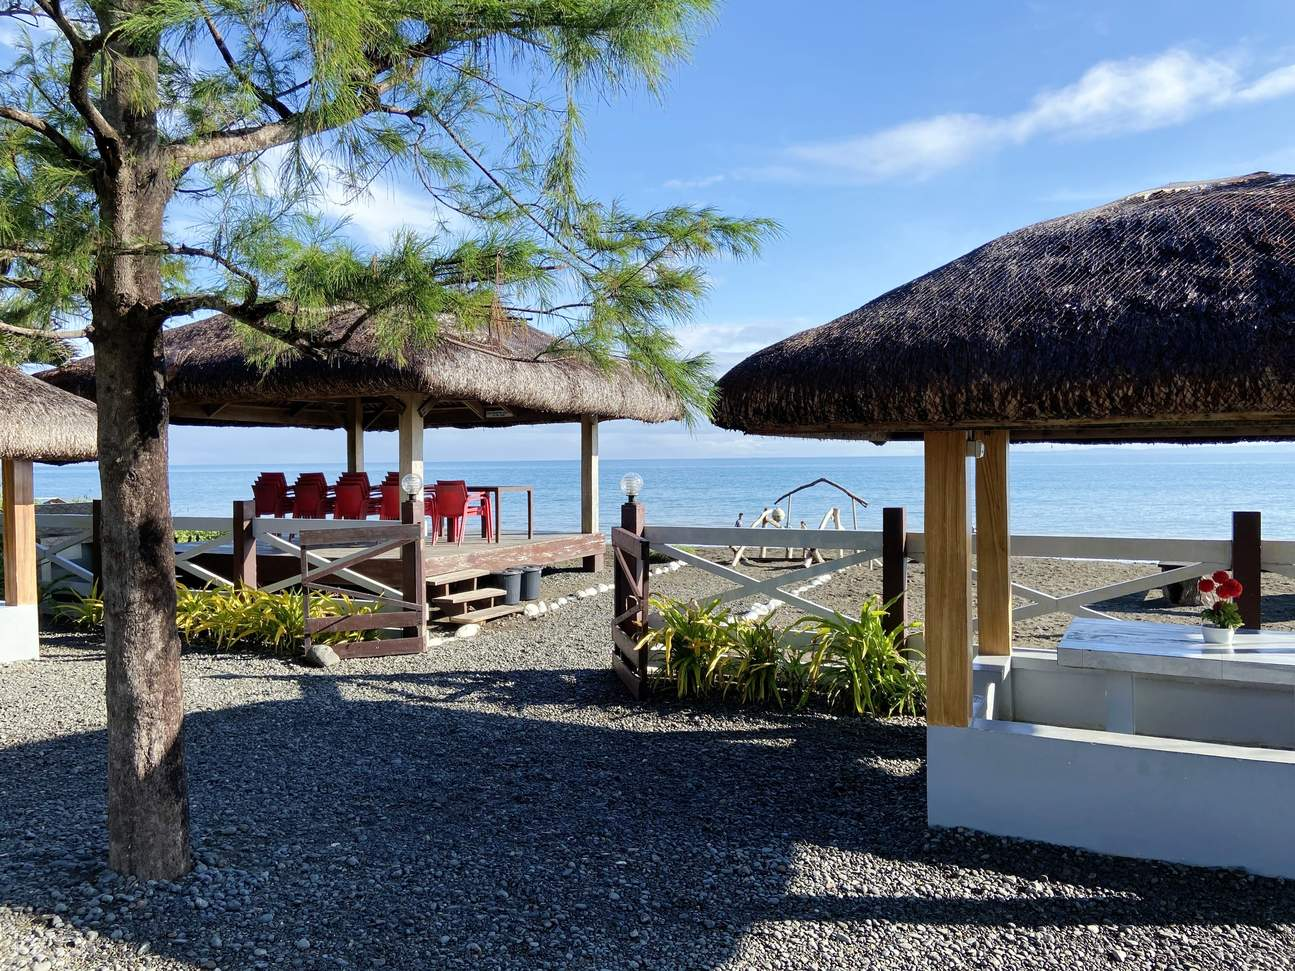 Tres Pinos Beach Resort beach front